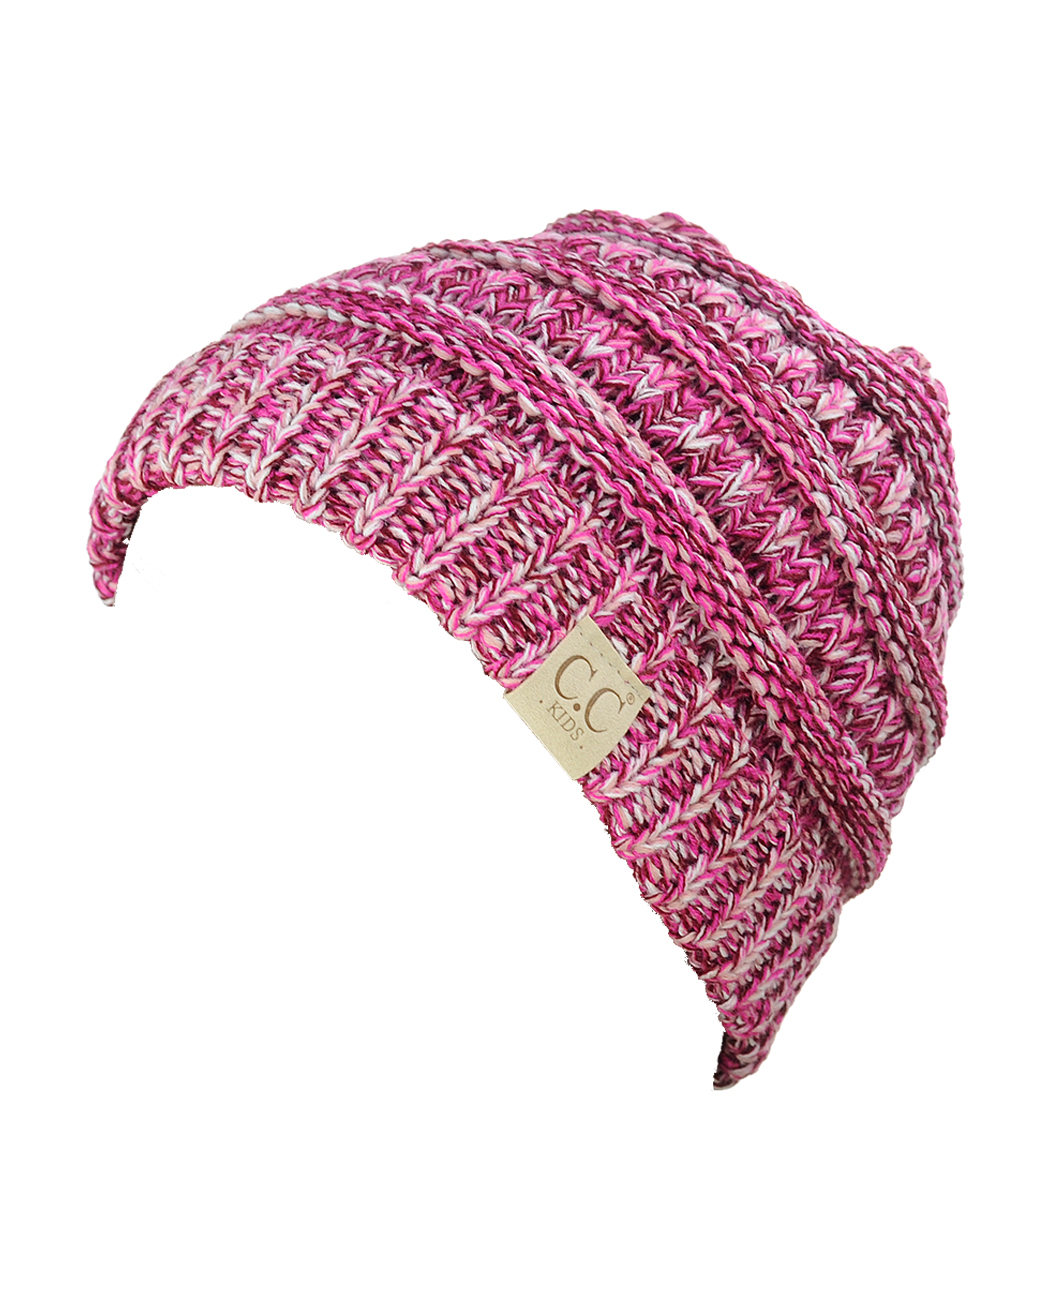 NYFASHION101® Kids C.C Cute Warm and Comfy Children's Knit Ski Beanie Hat